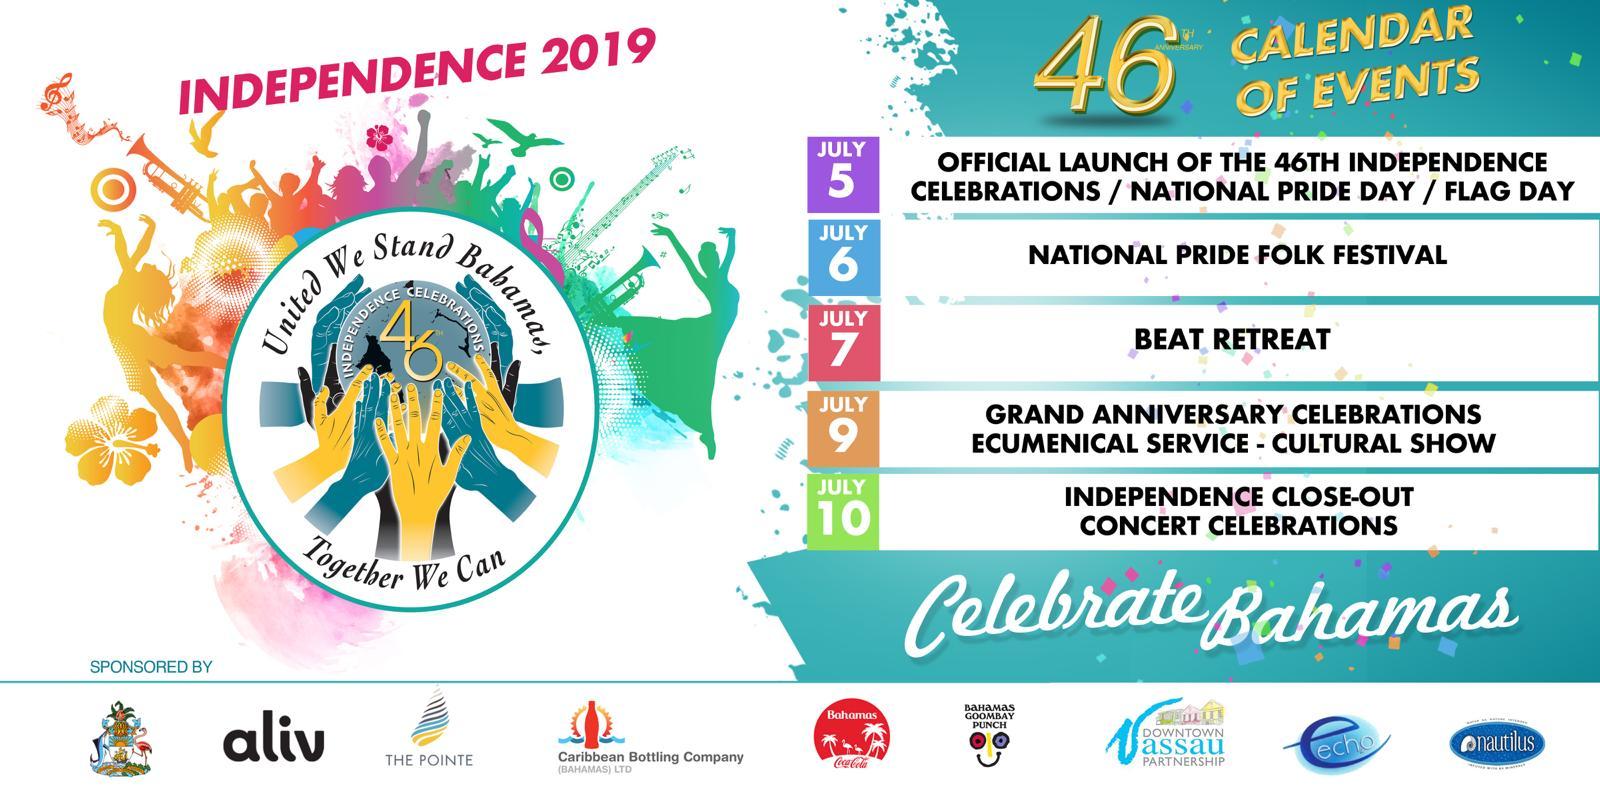 National Pride Folk Festival